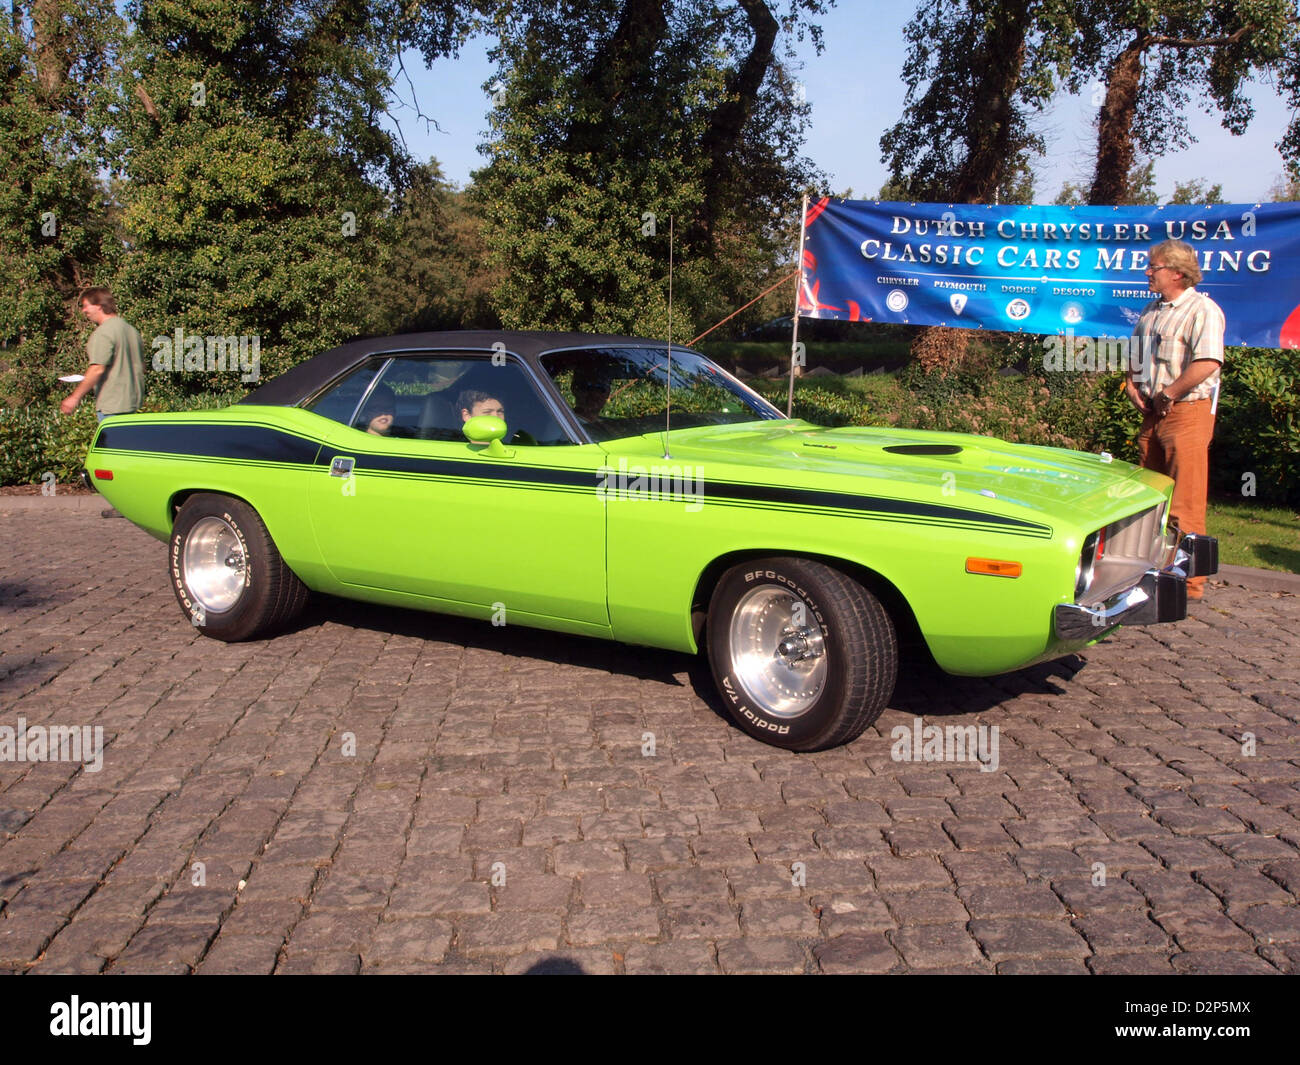 1973 Plymouth Barracuda Stock Photo: 53347866 - Alamy